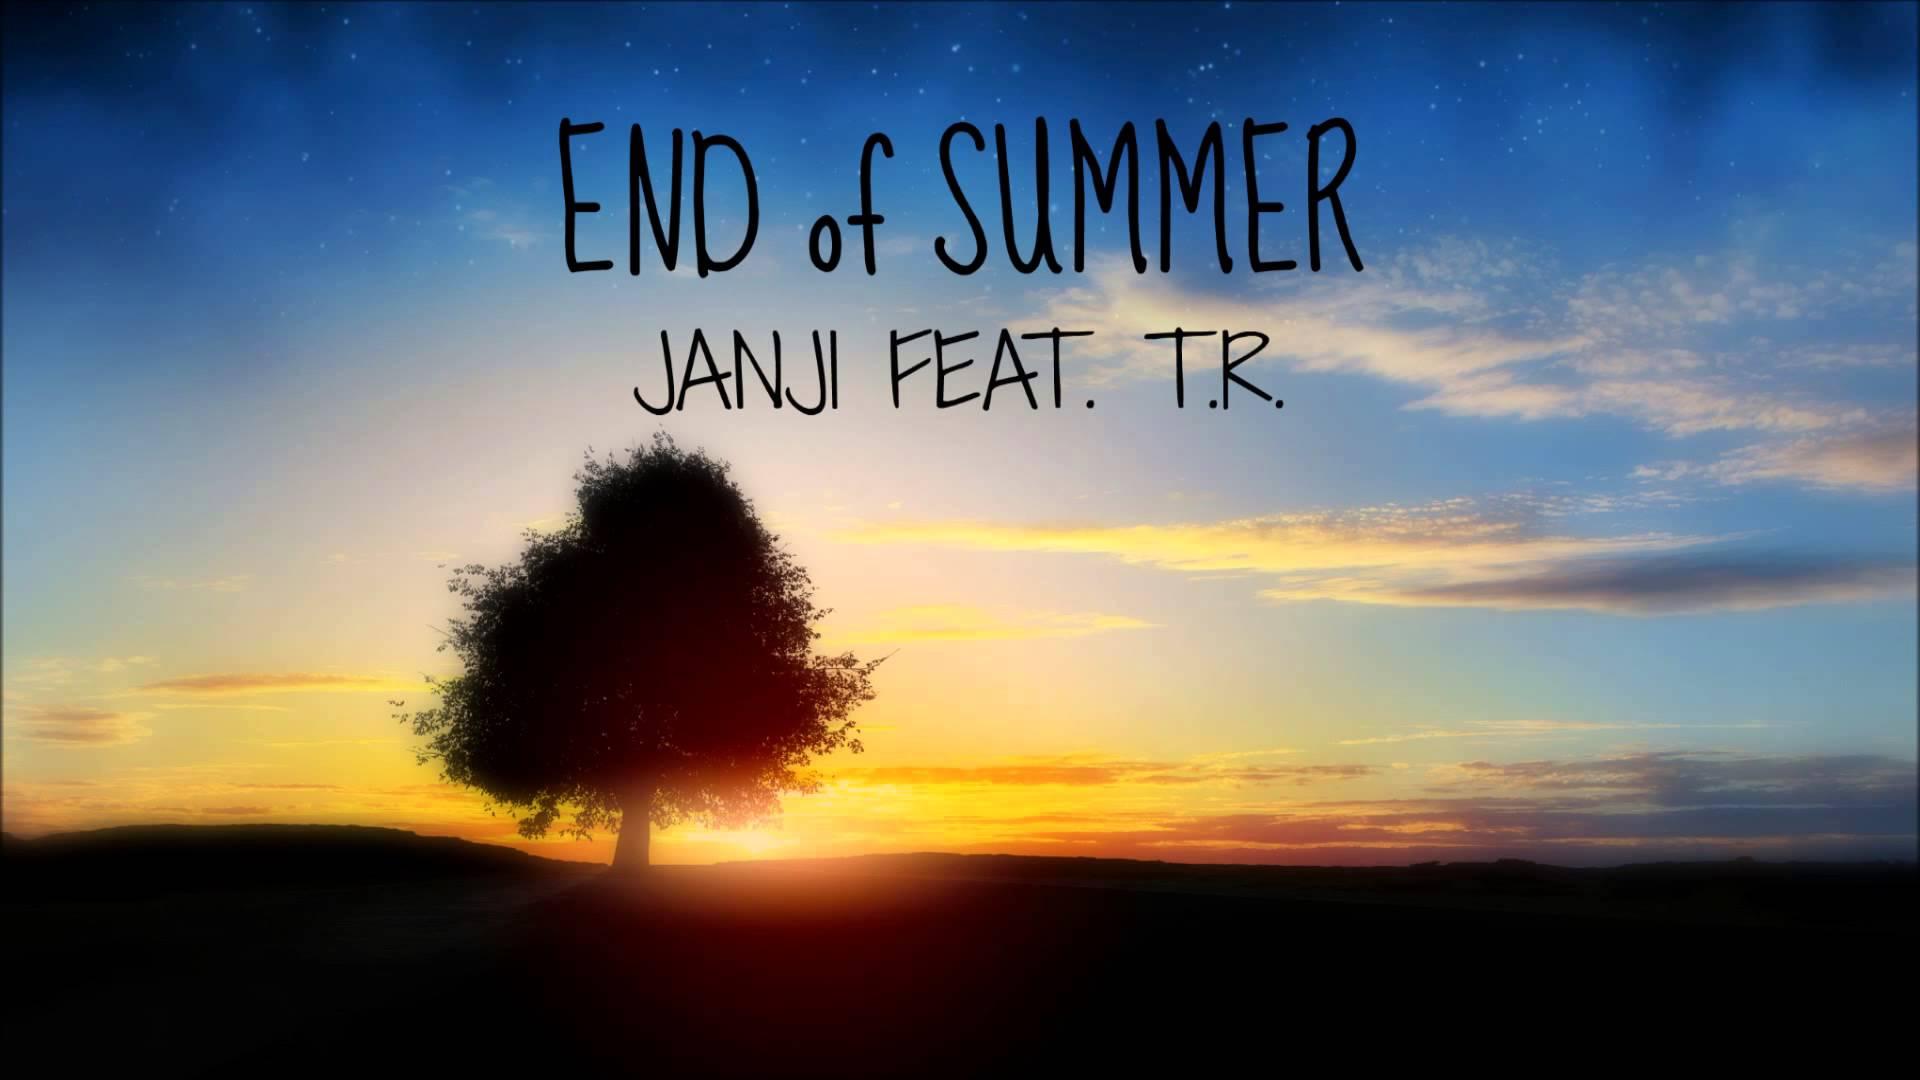 Janji feat. T.R. - End of Summer